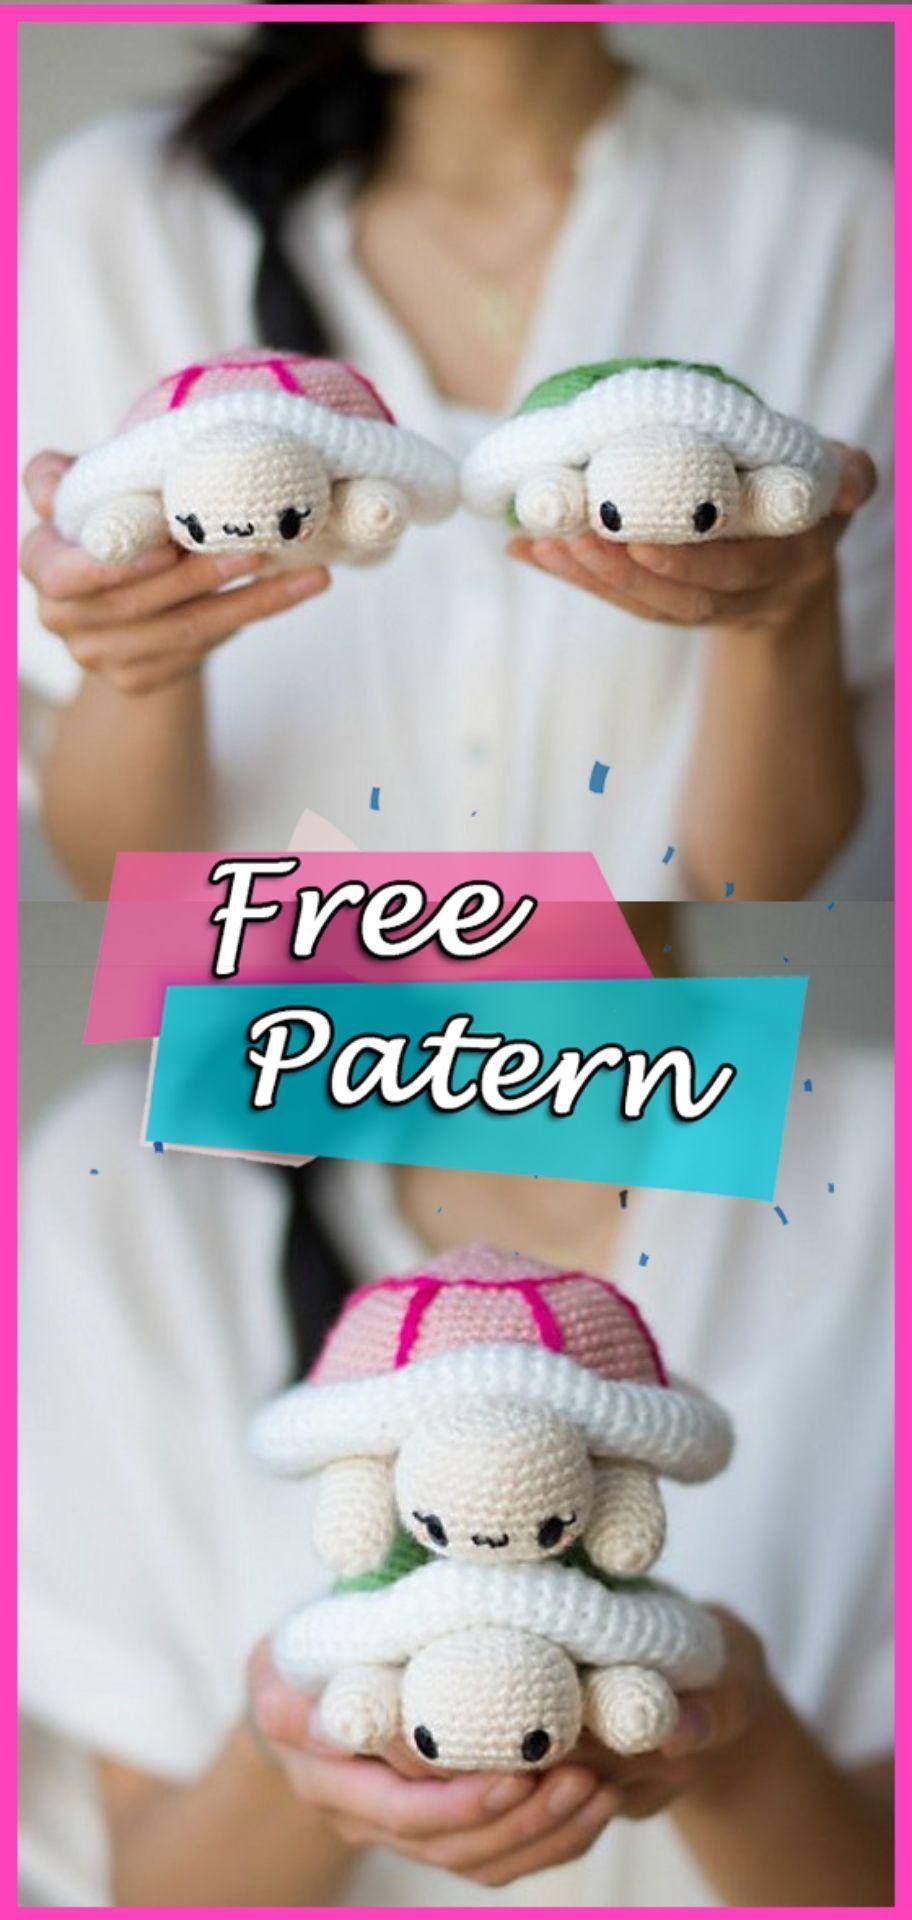 Amigurumi Turtle Crochet Free Pattern Animal DIY – YARN OF CROCHET